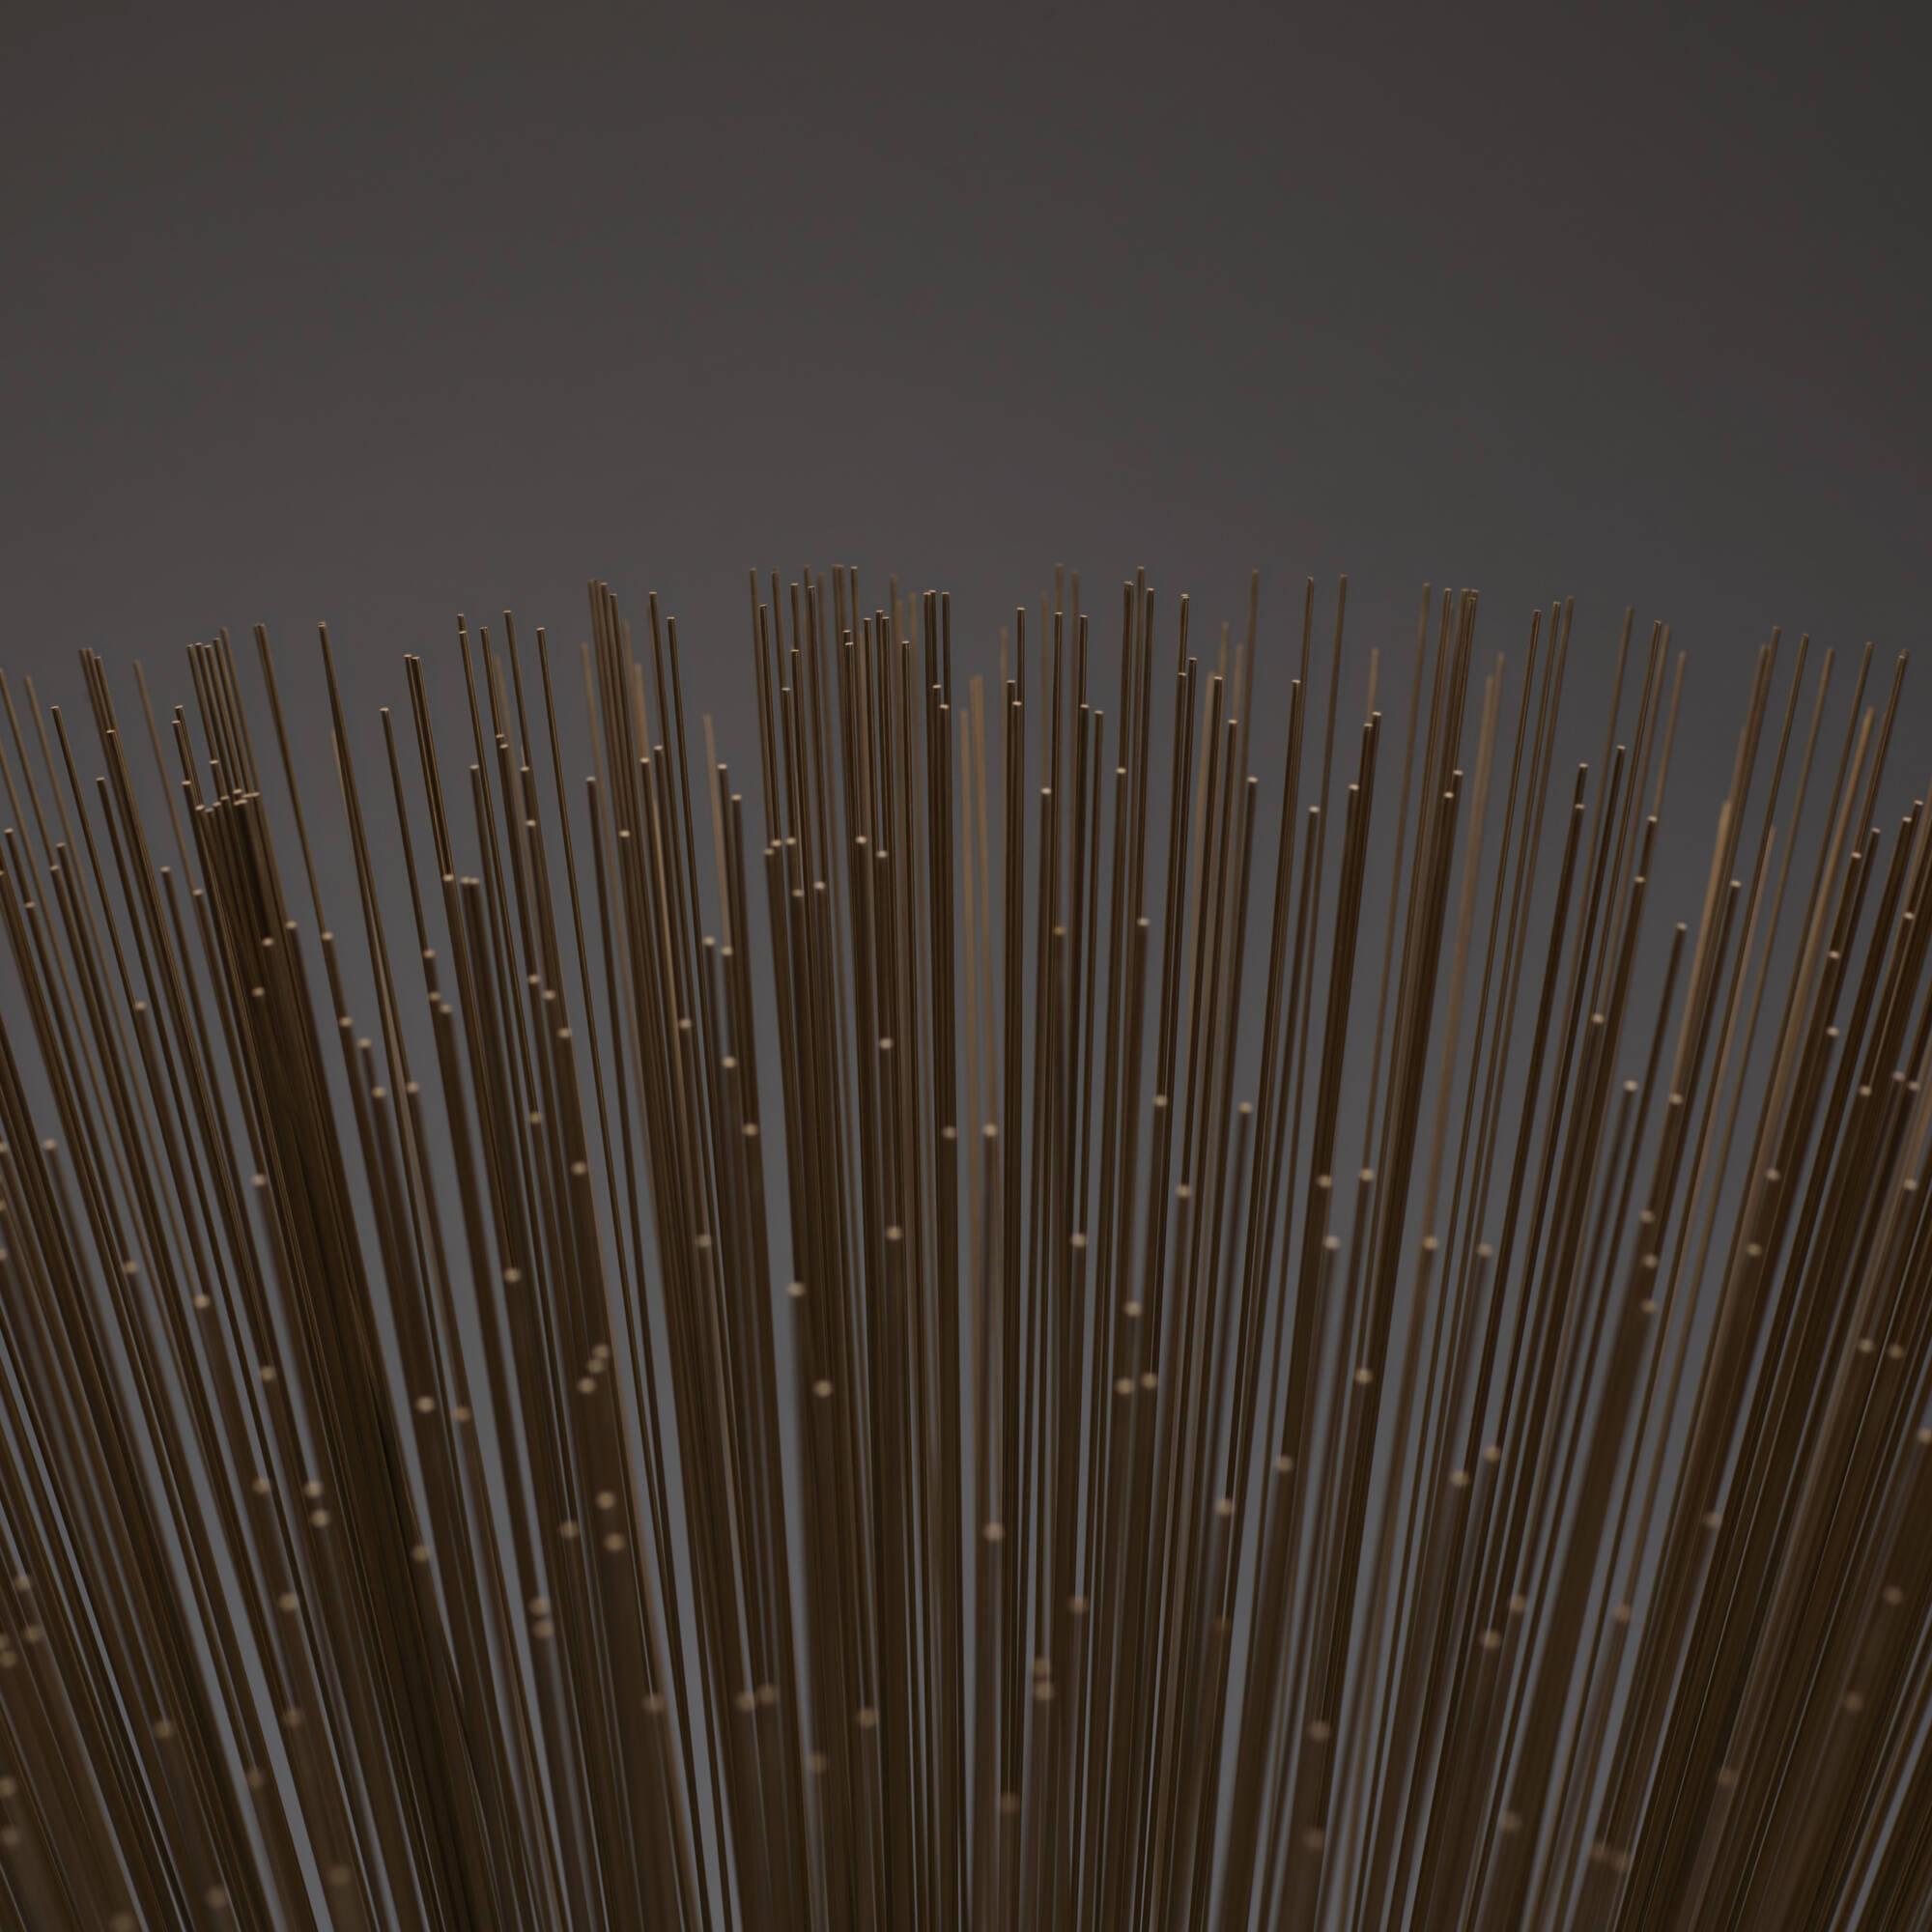 138: Harry Bertoia / Untitled (monumental Spray) (2 of 2)